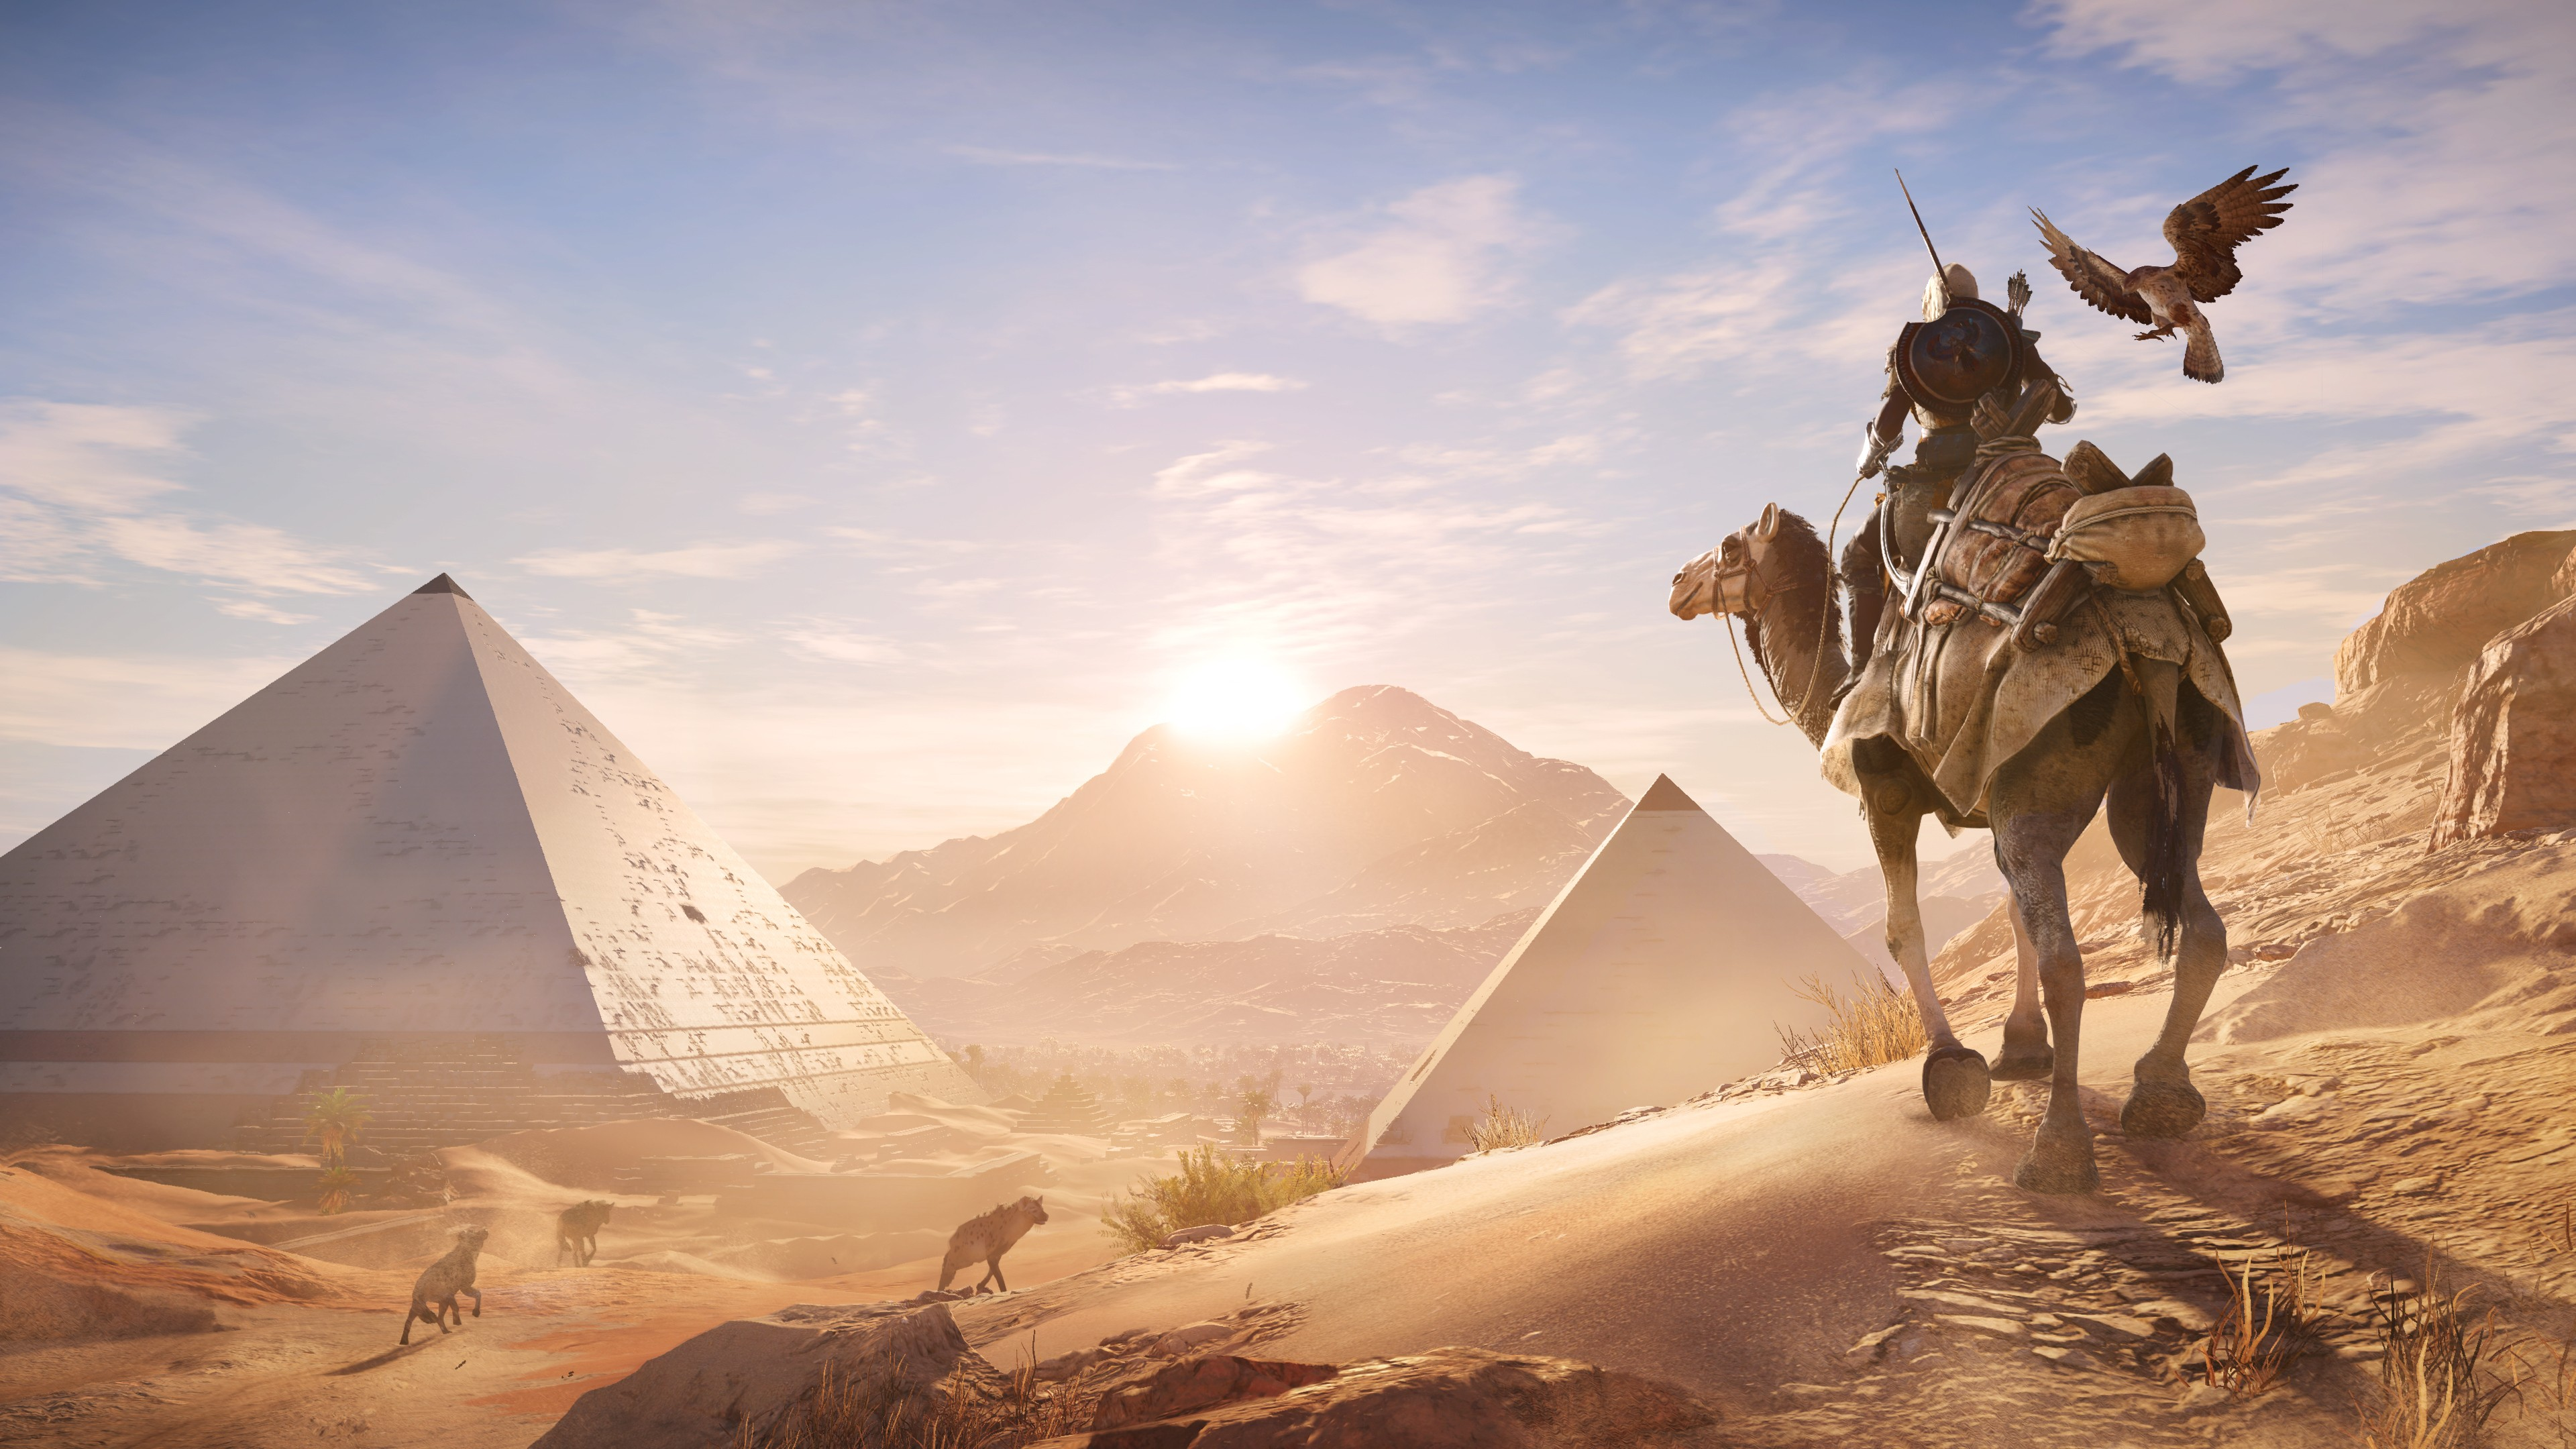 Wallpaper Assassin's Creed Origins, 4k, E3 2017